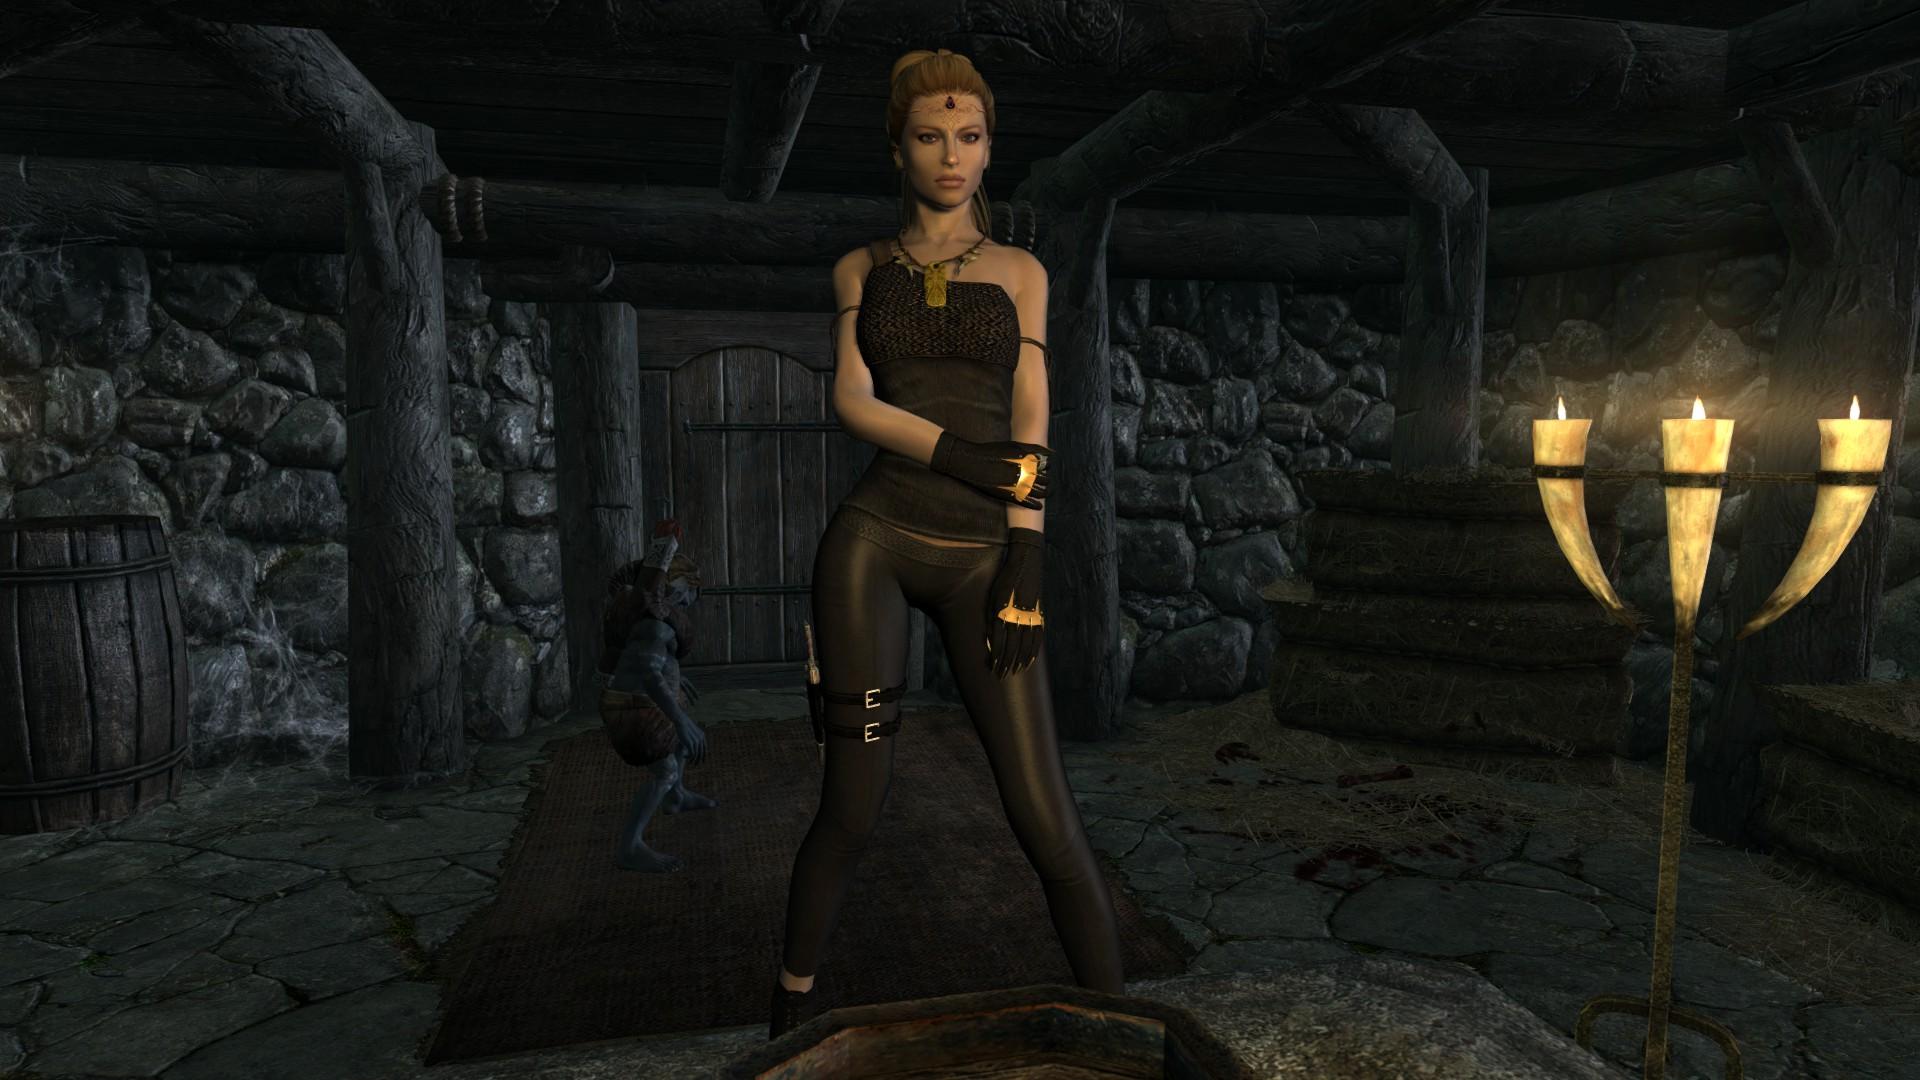 20180725033319_1.jpg - Elder Scrolls 5: Skyrim, the